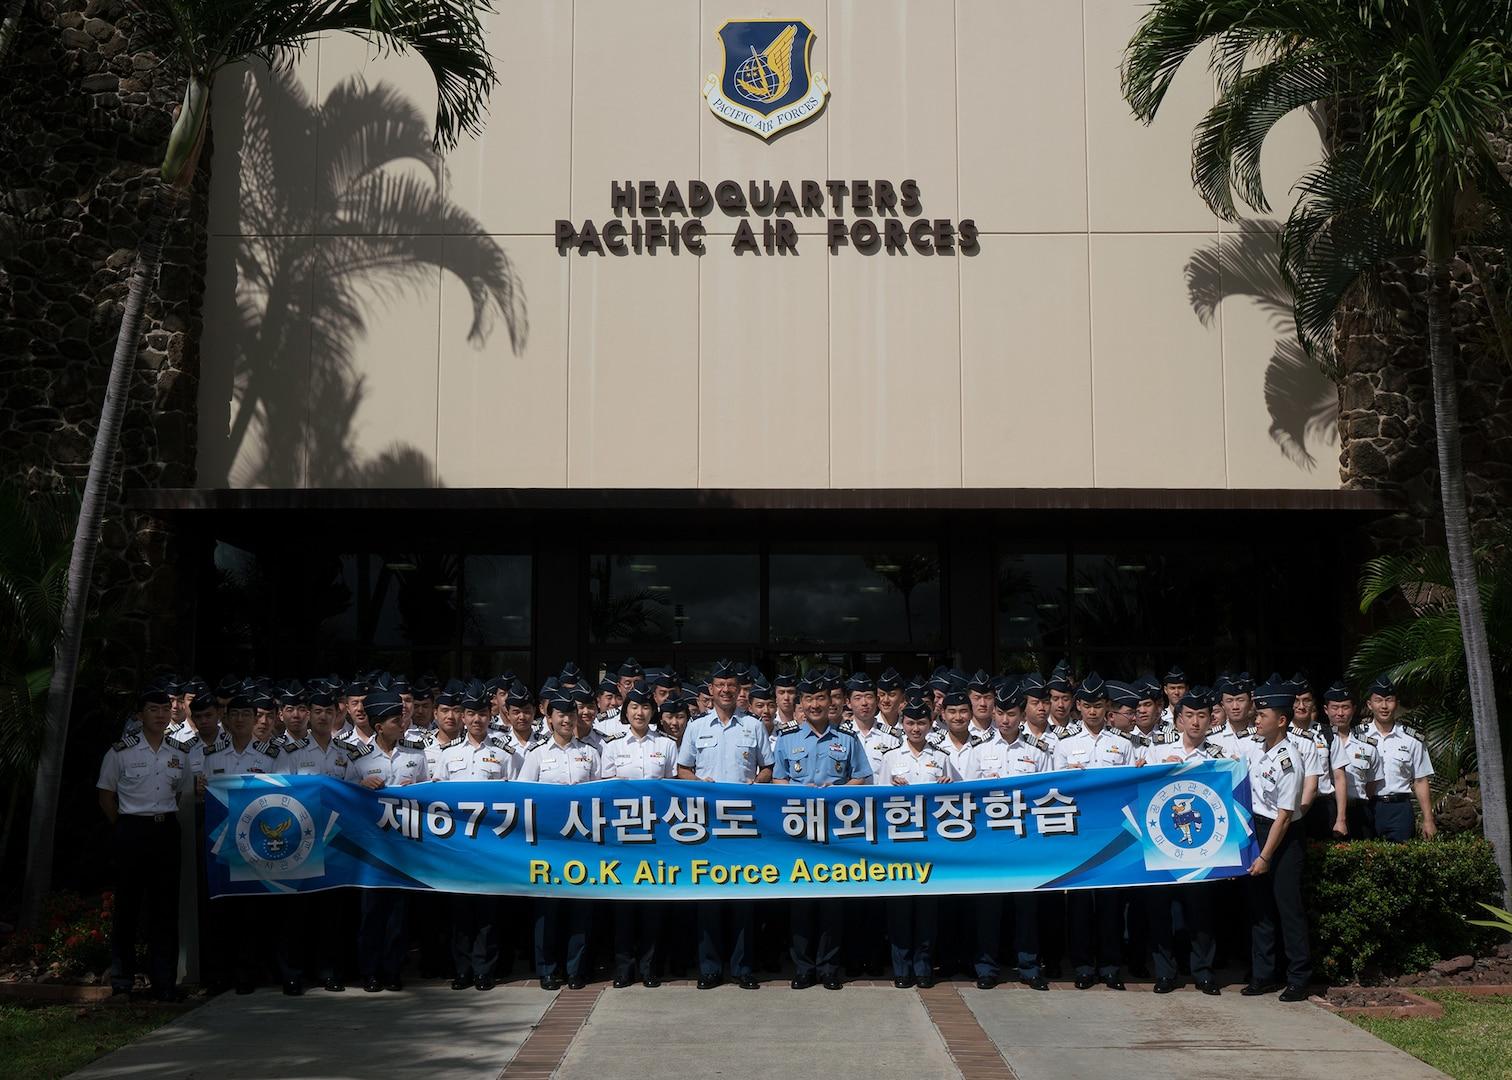 PACAF hosts ROKAF Academy cadets